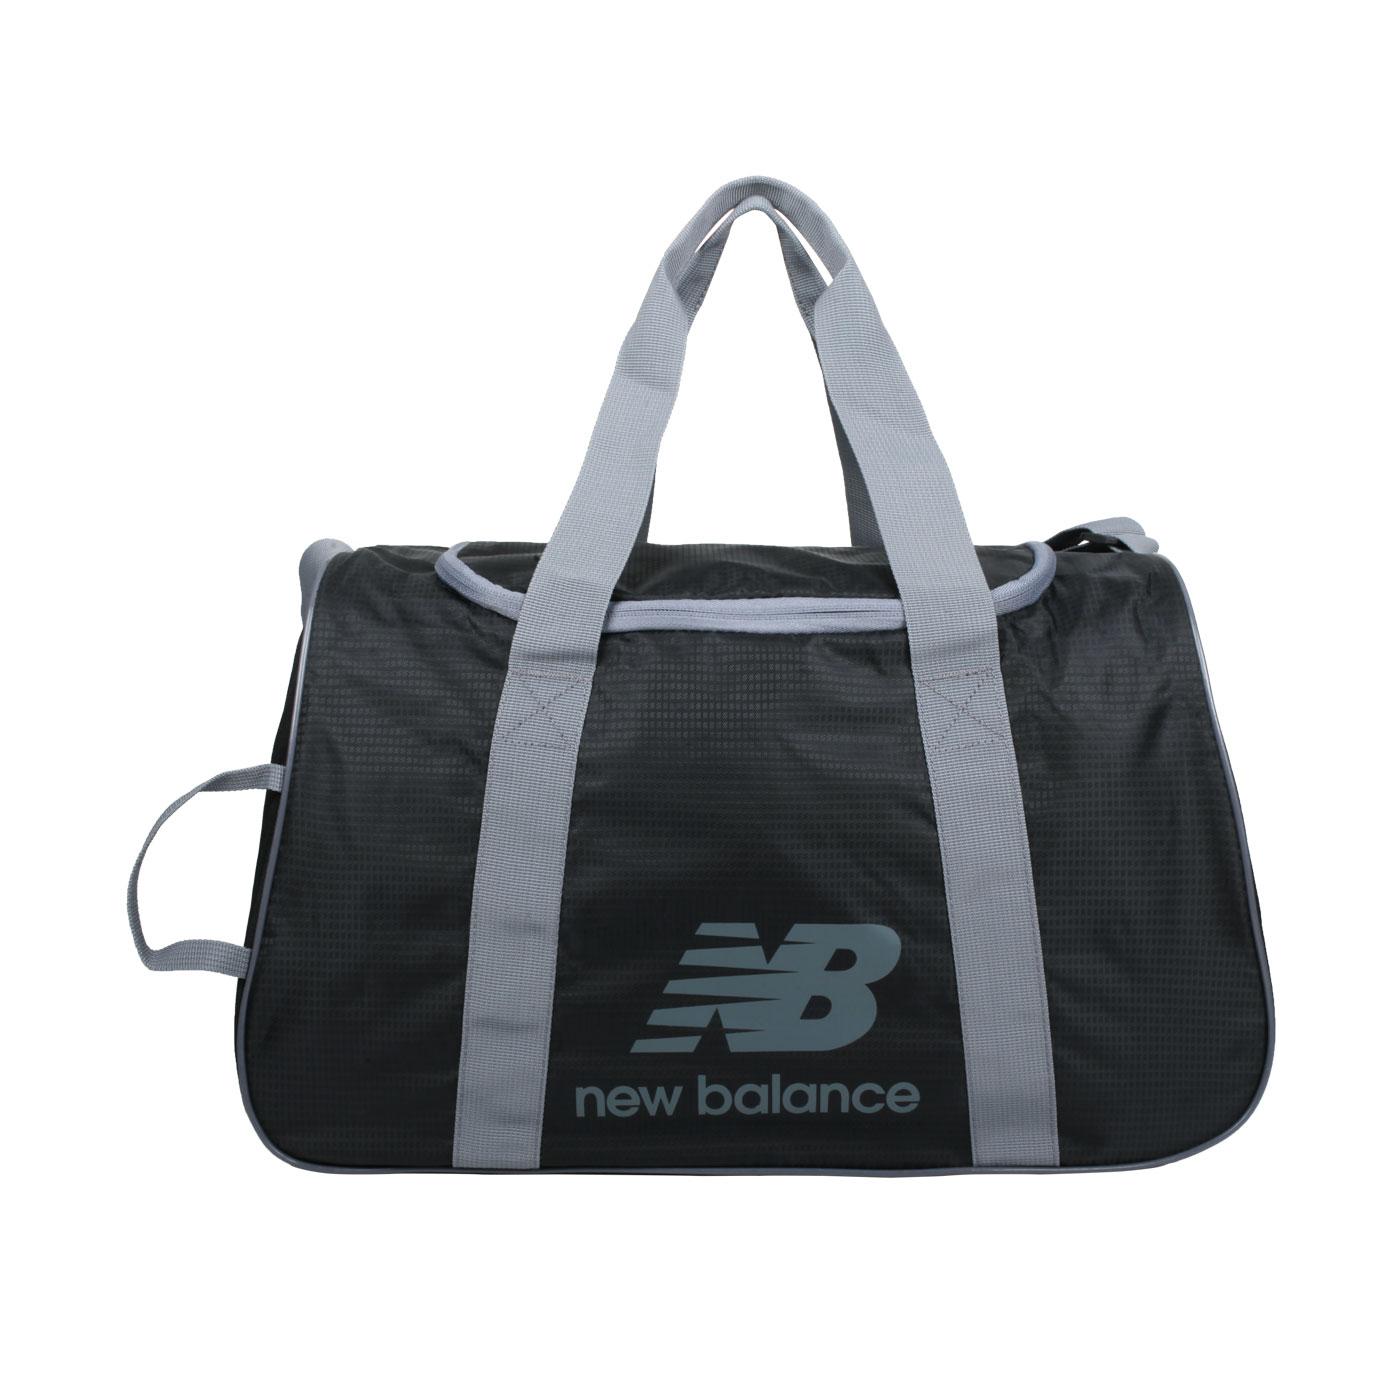 NEW BALANCE 中型運動提袋 LAB11108